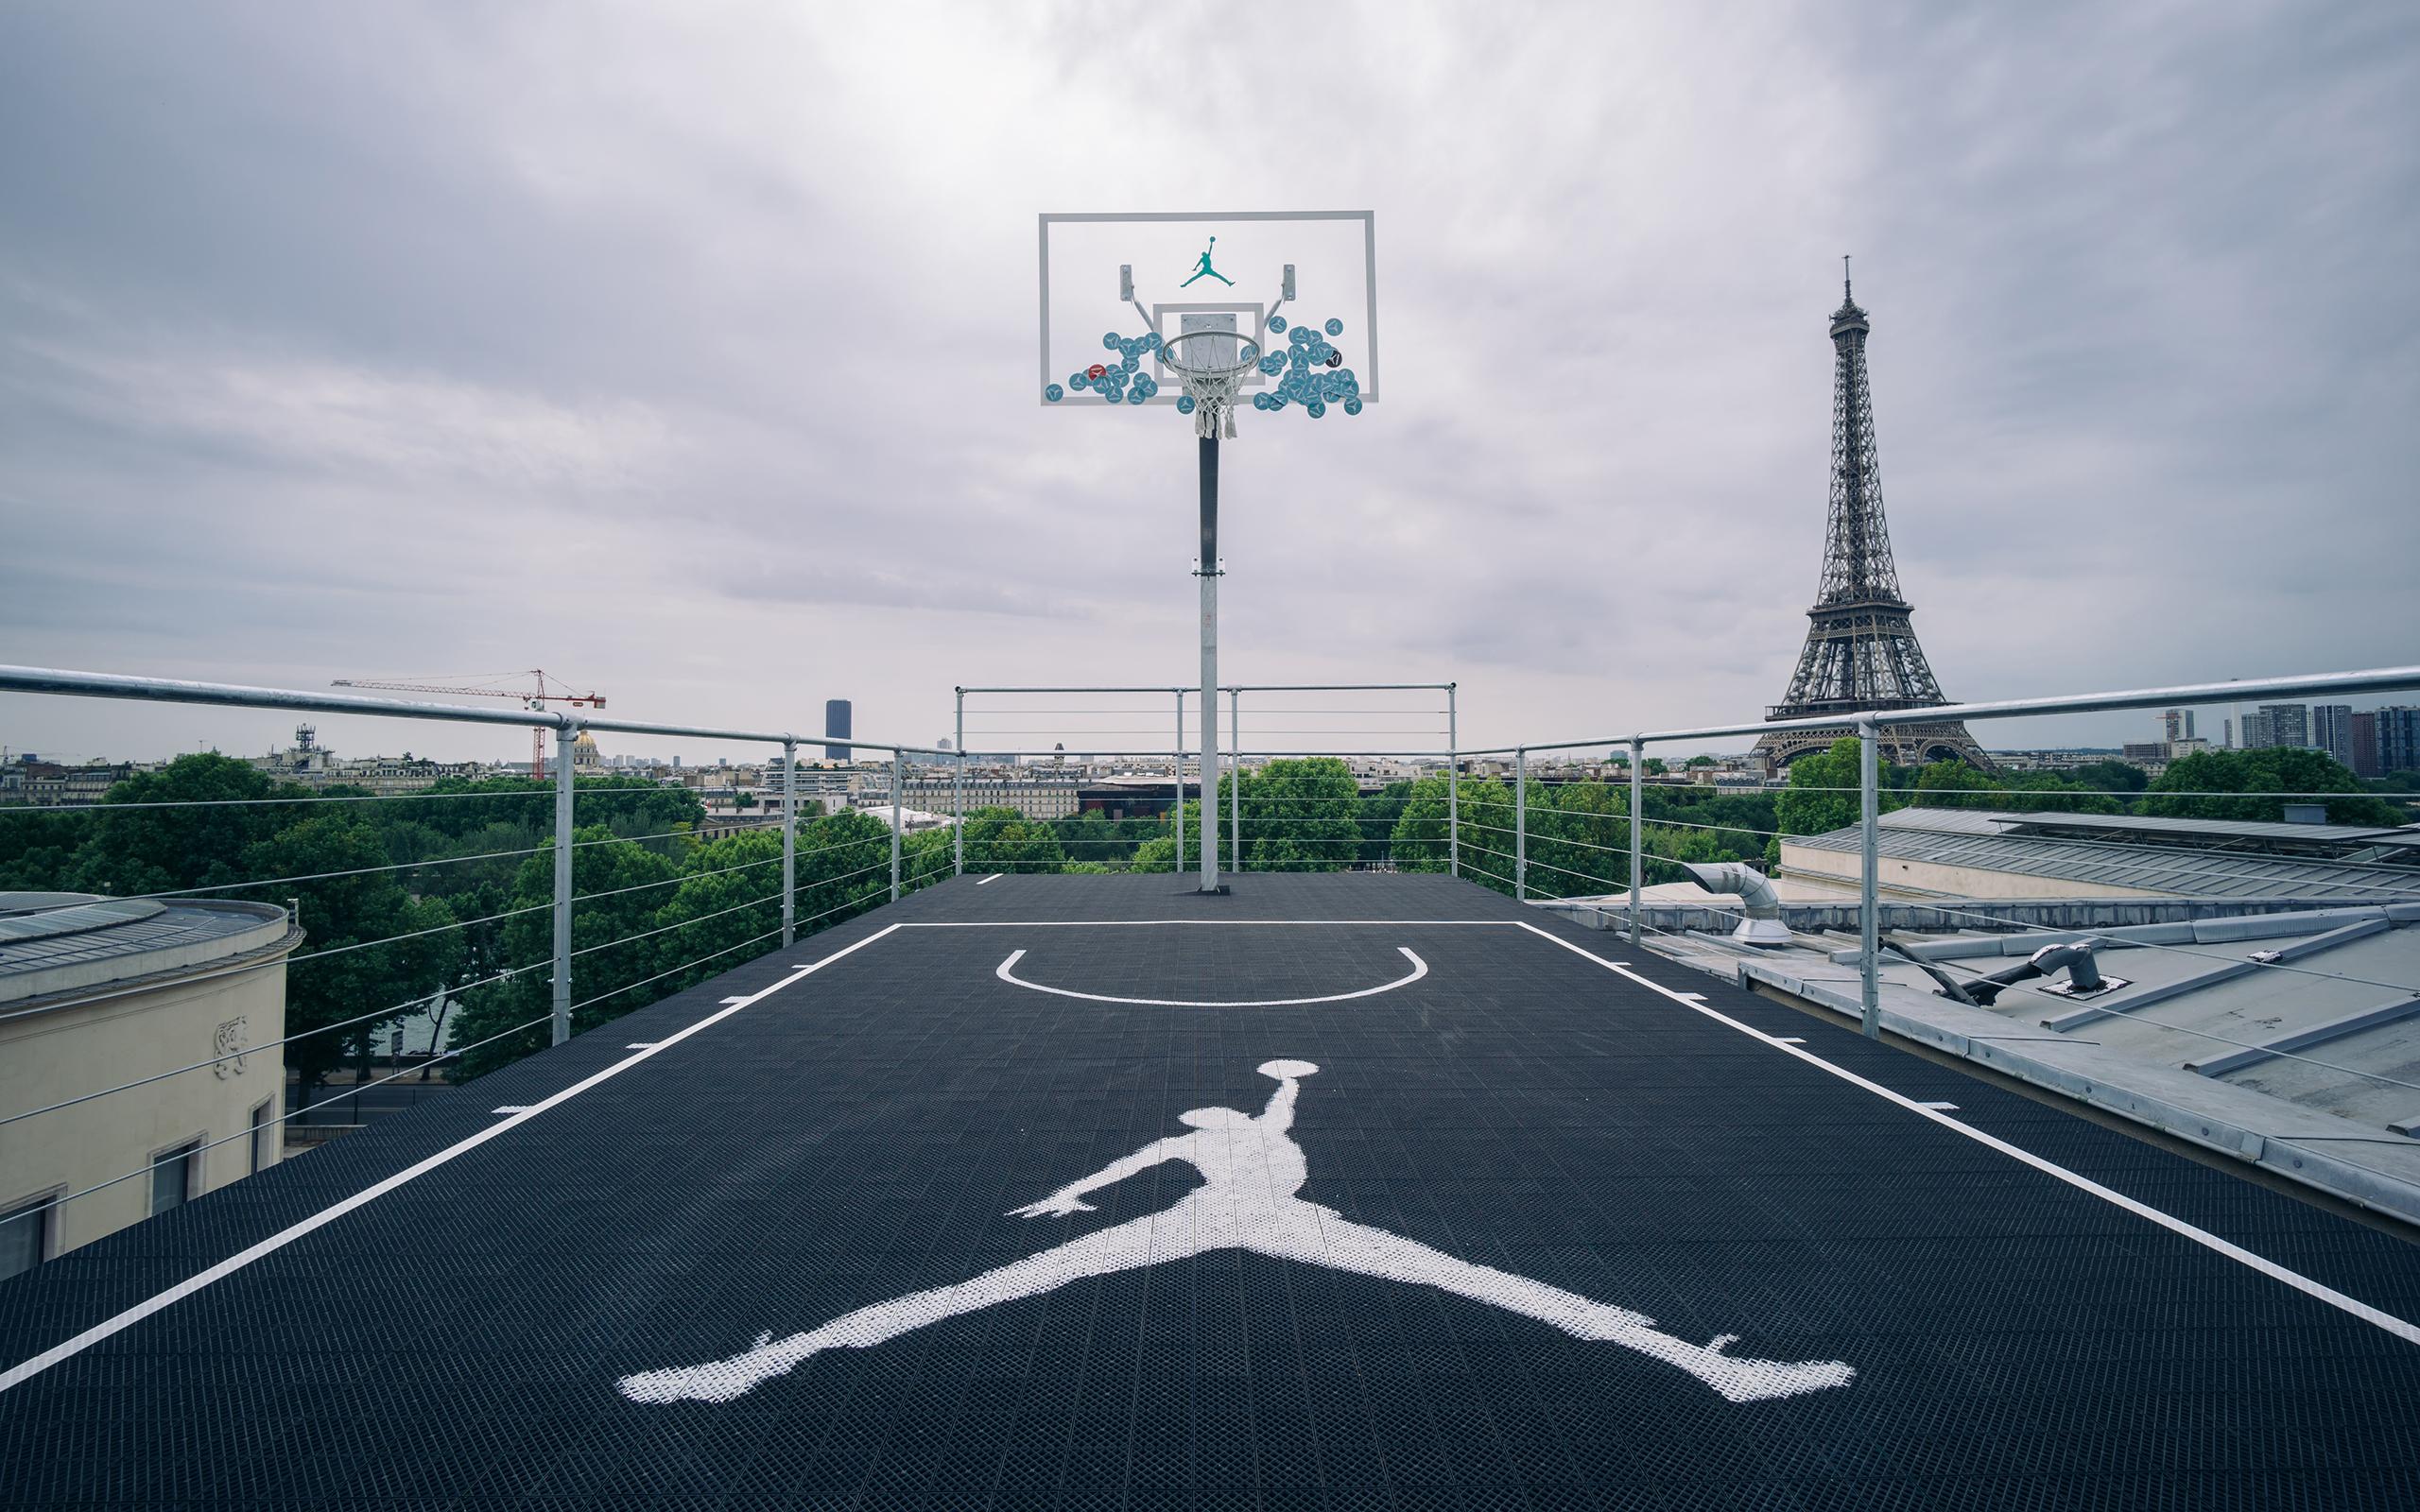 American Graffiti Cars Wallpaper Free Download Basketball Court Wallpaper Media File